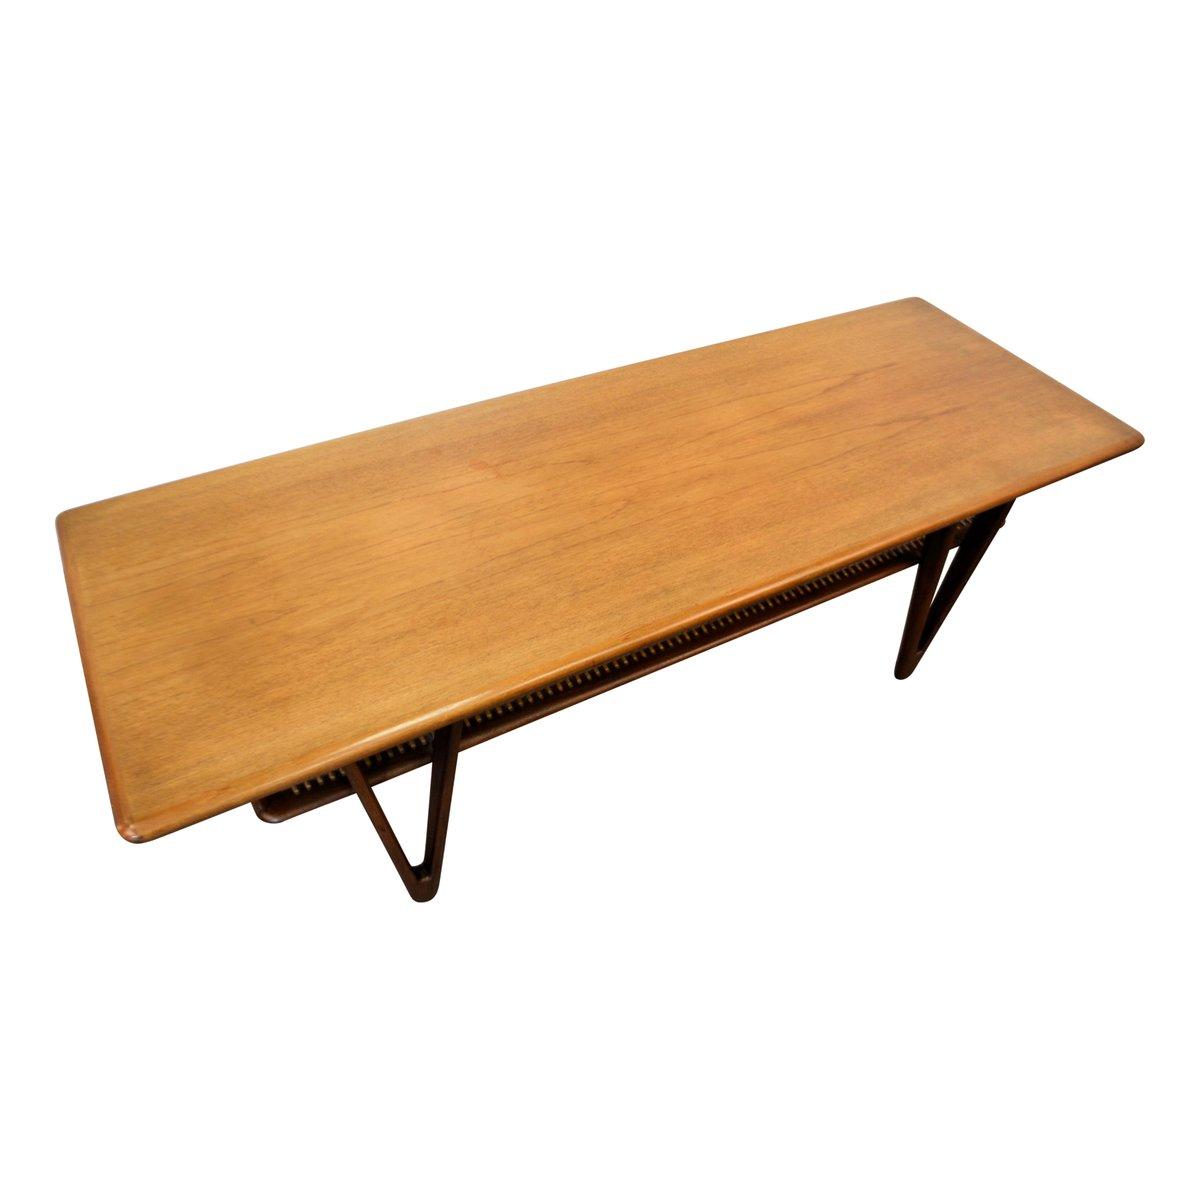 Mid-Century Modern Danish Teak Coffee Table, 1950s For